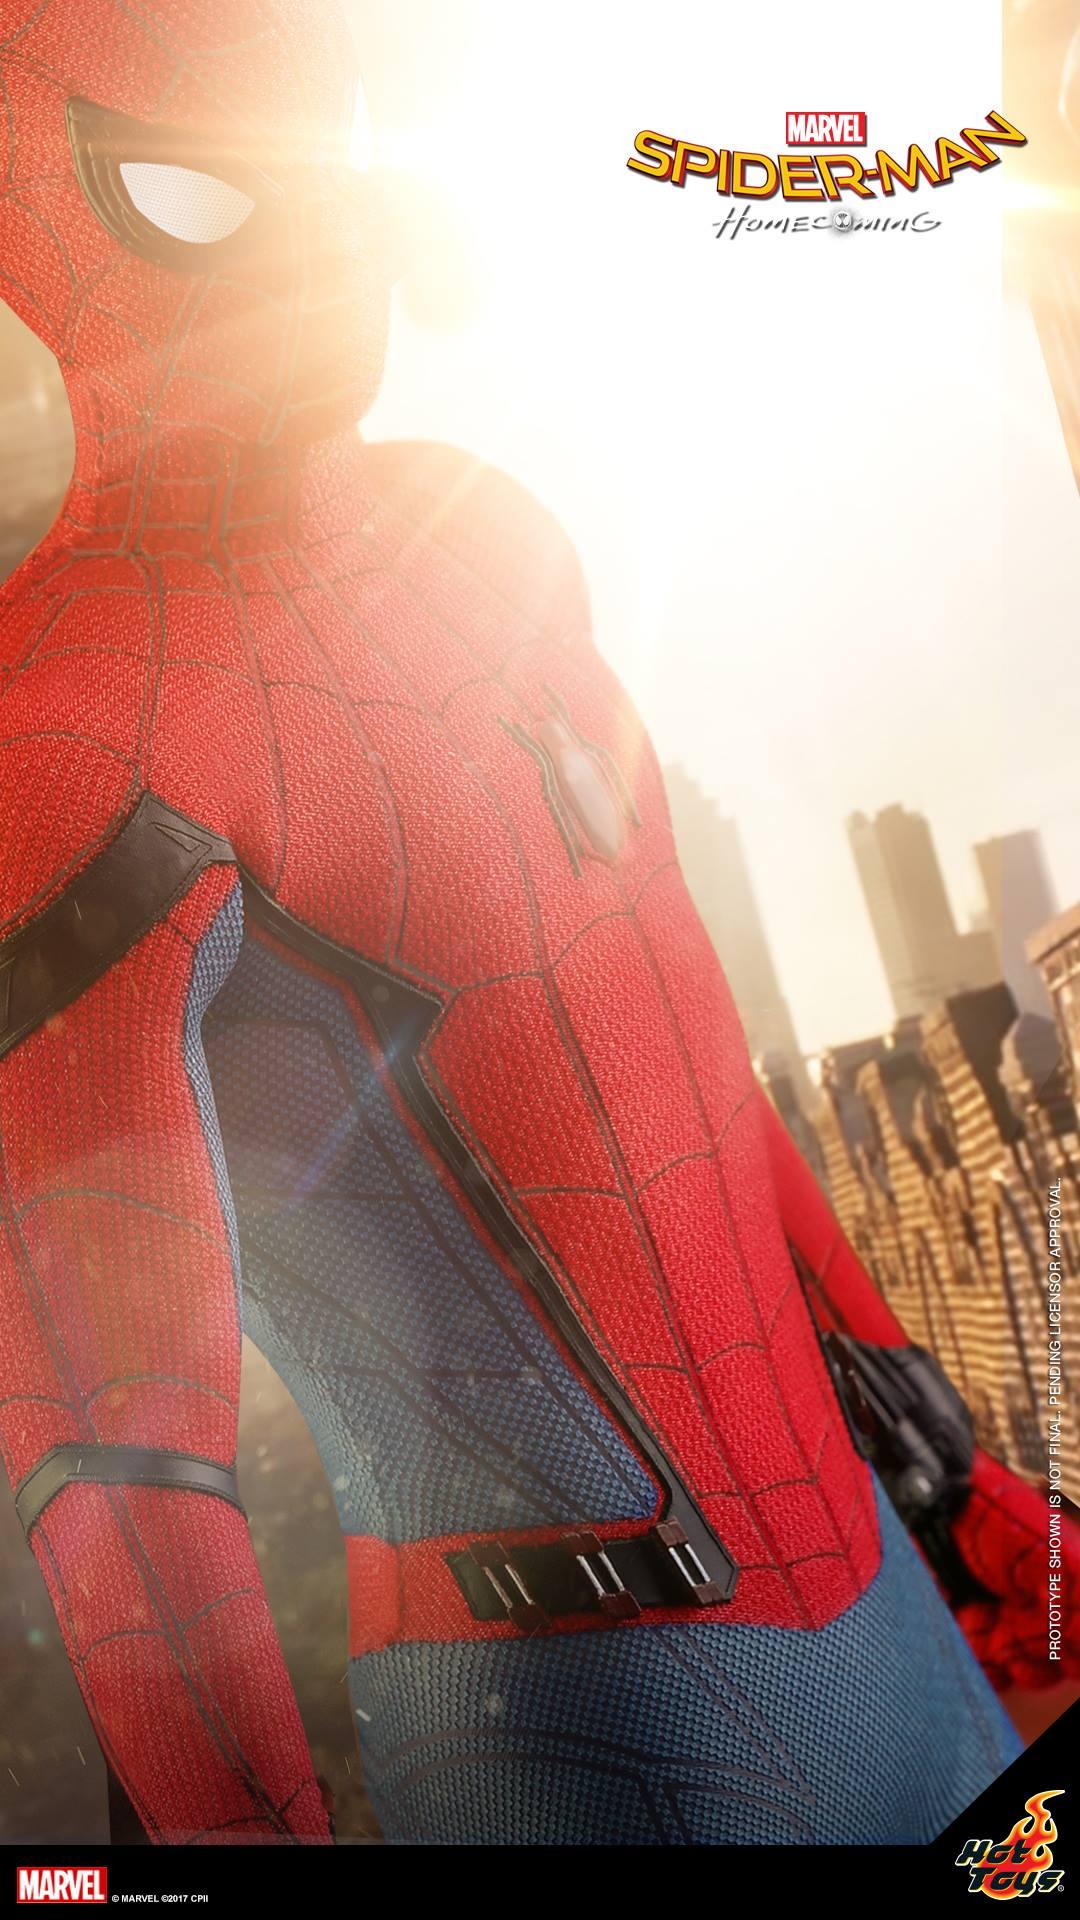 hot toys spider-man mcu